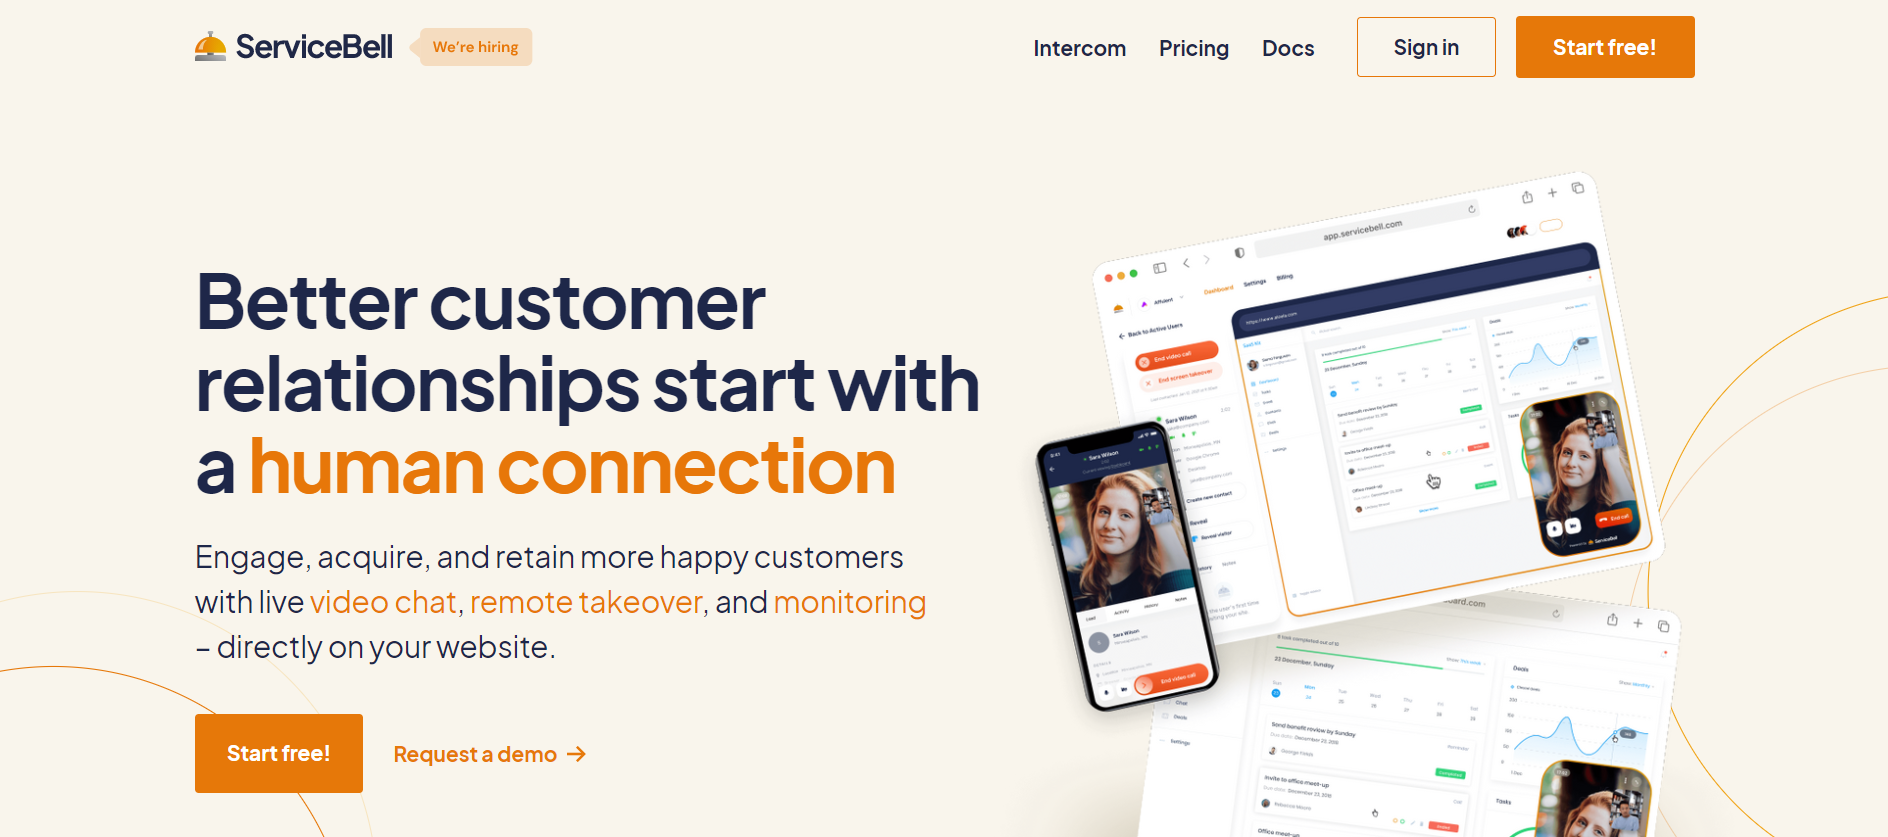 ServiceBell website